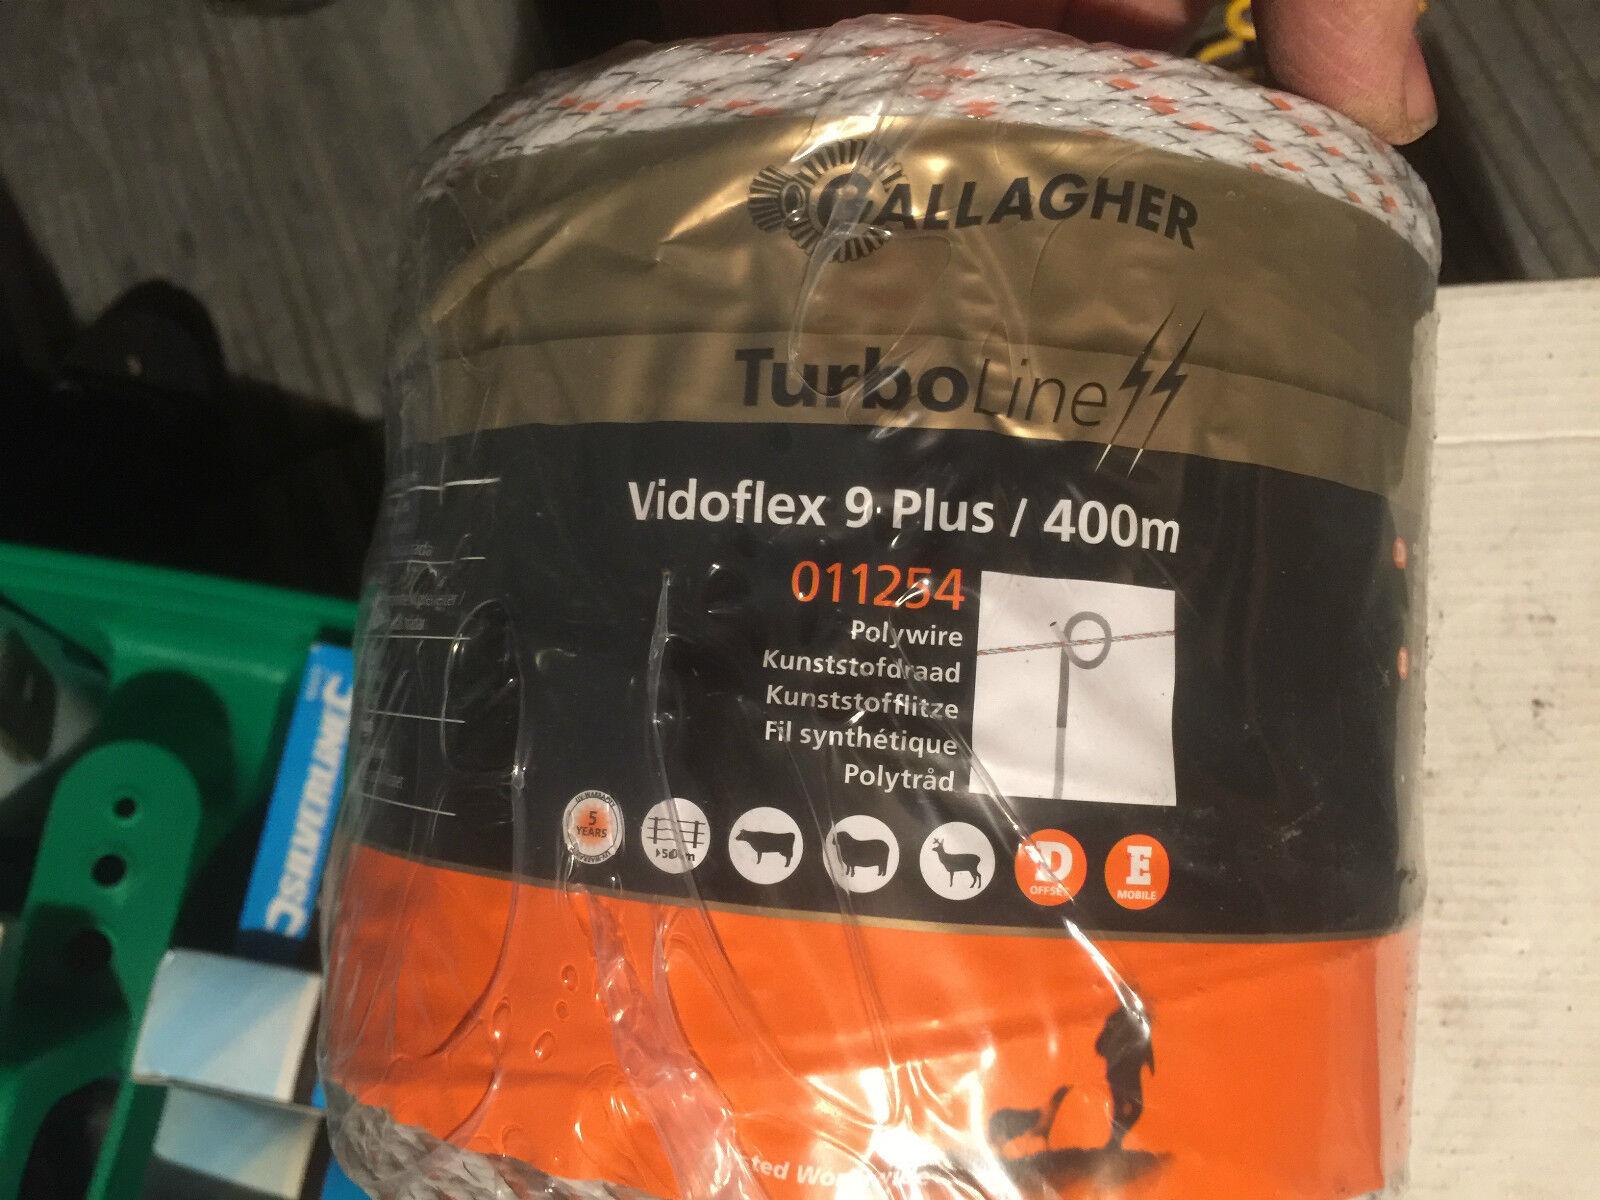 Gallagher vidoflex Elettrico Scherma Polywire Turboline PLUS 400m Bianco 011254